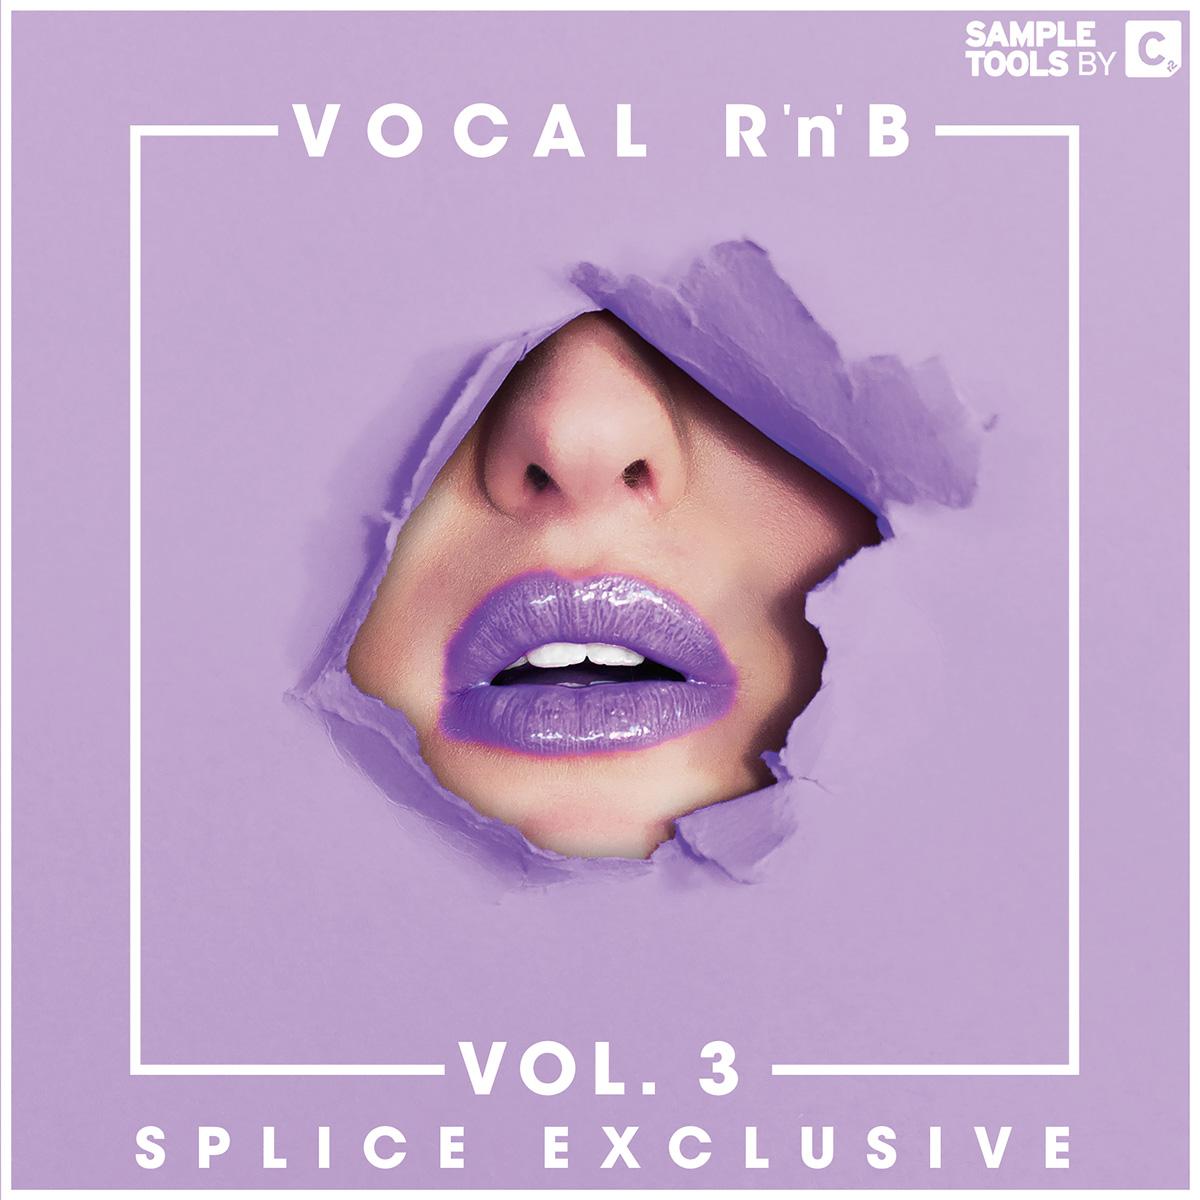 SAMPLE TOOLS BY CR2の人気シリーズから『VOCAL RNB VOL.3』が登場